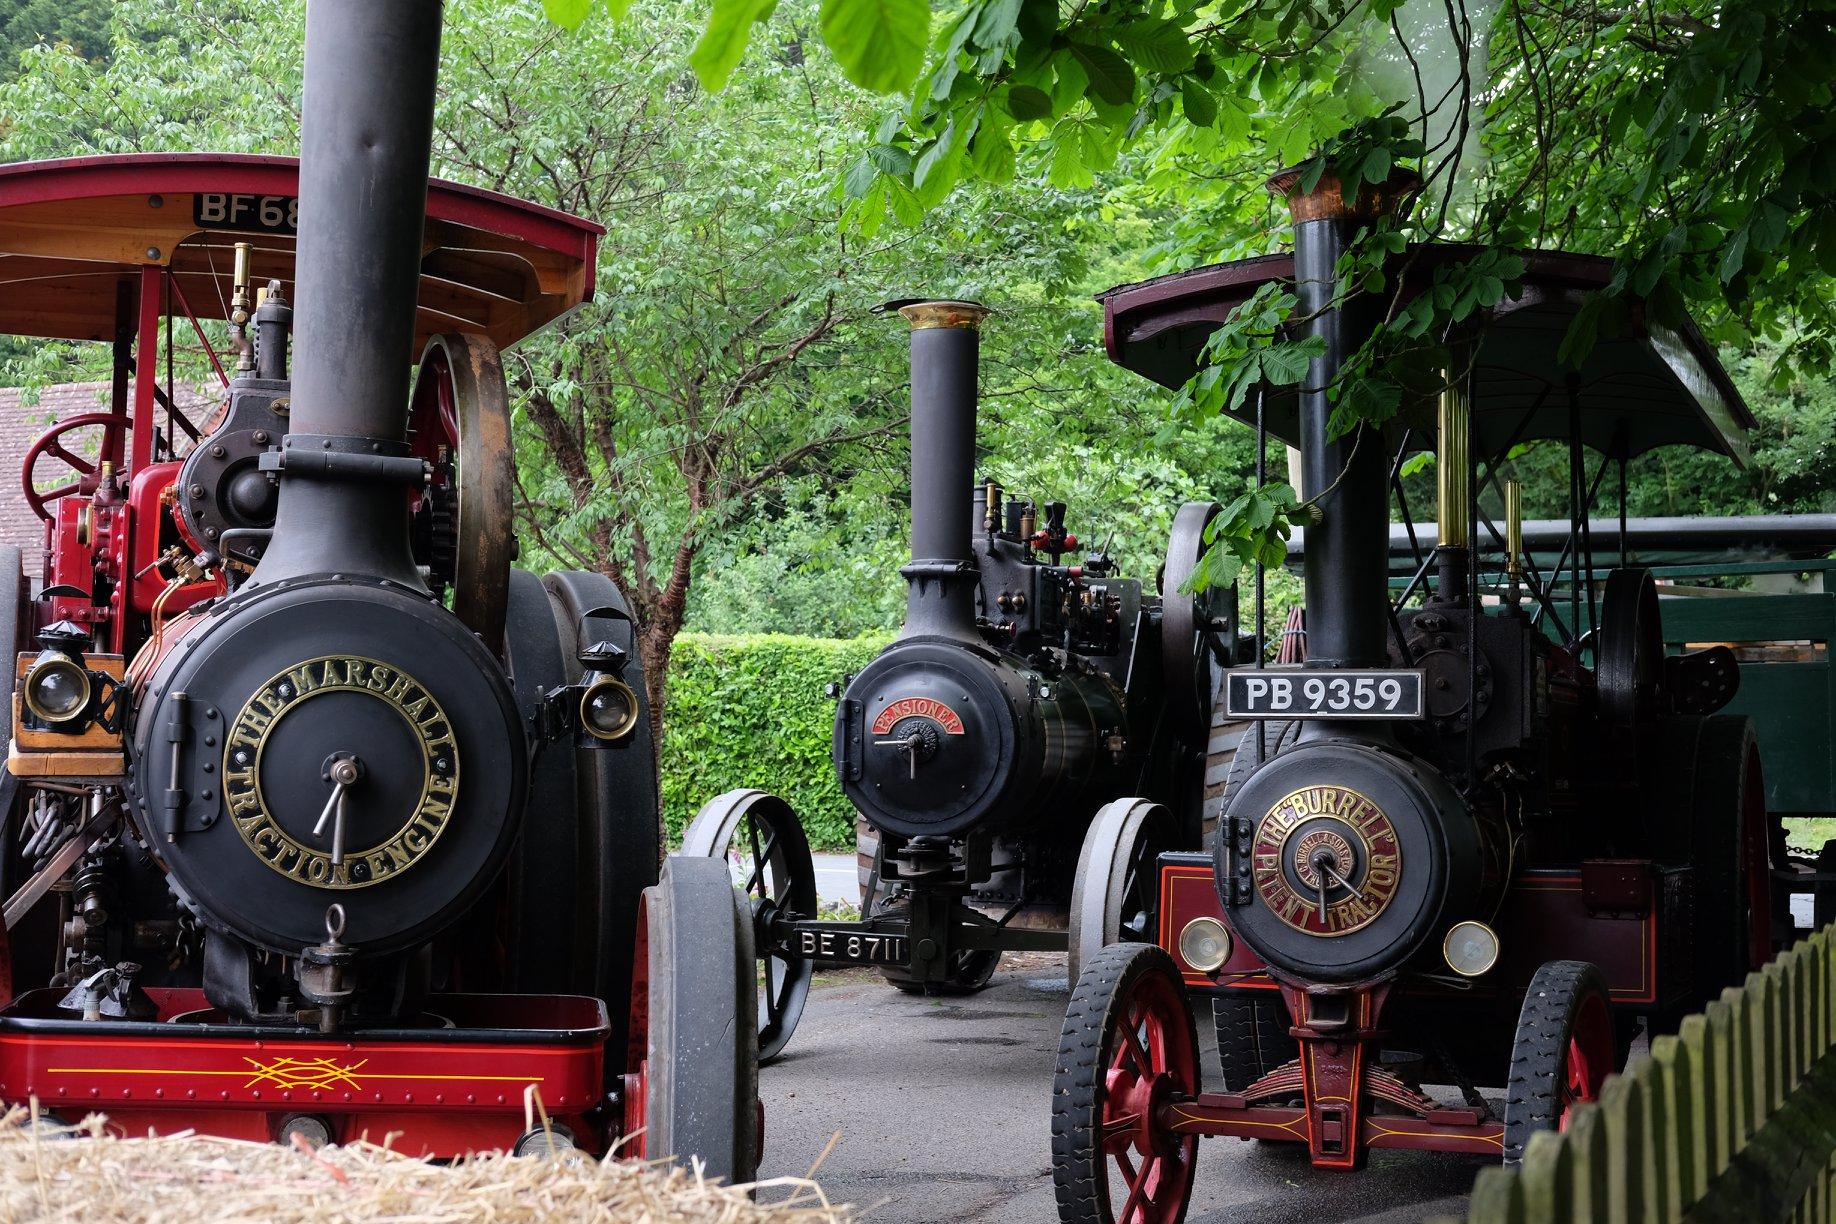 blackboys-inn-steam-engine-rally-10